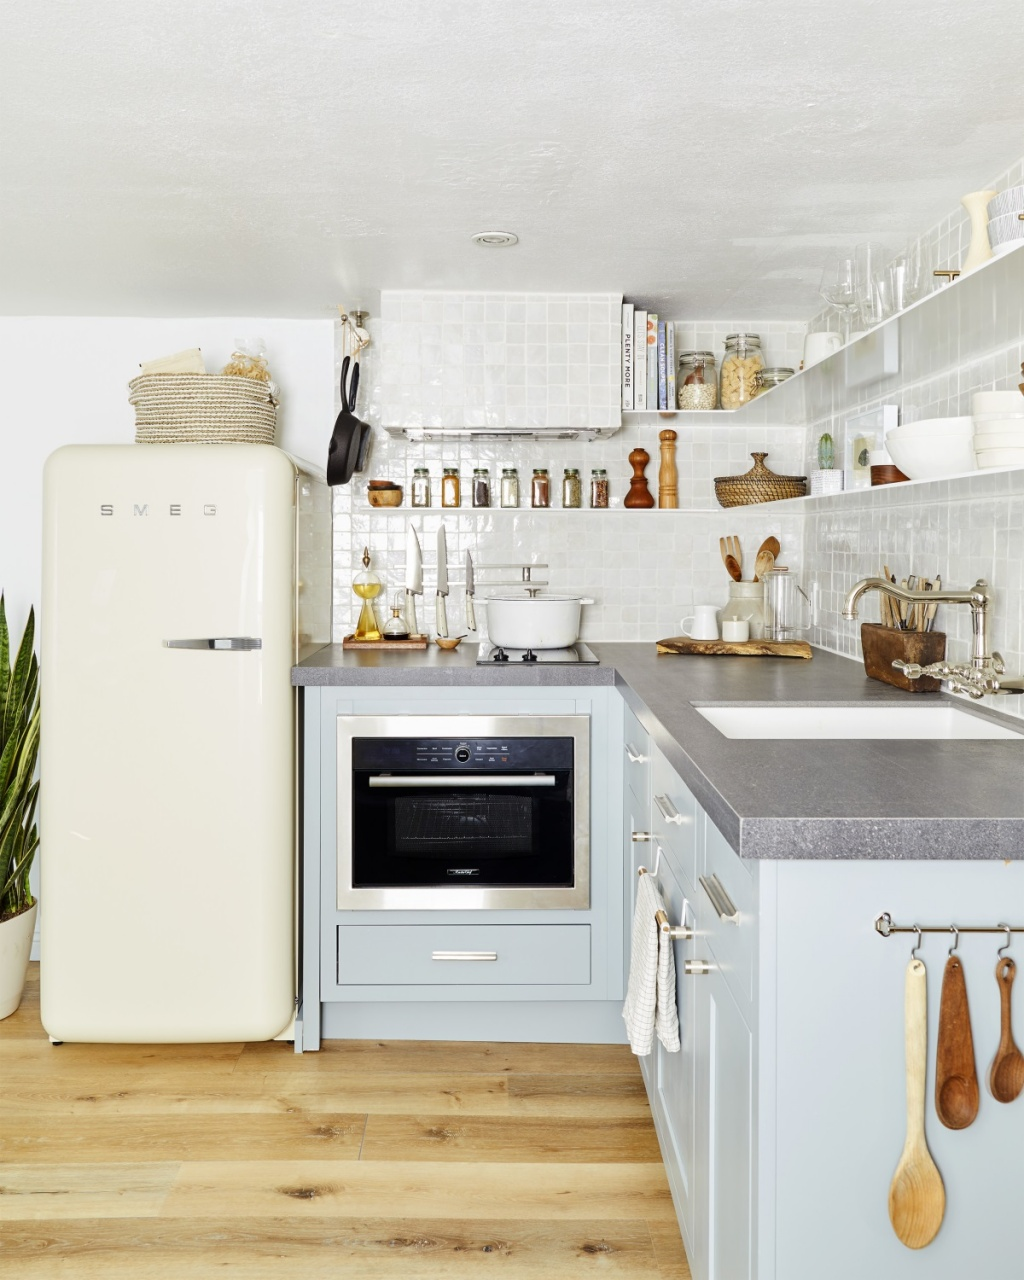 Economical kitchen shelves